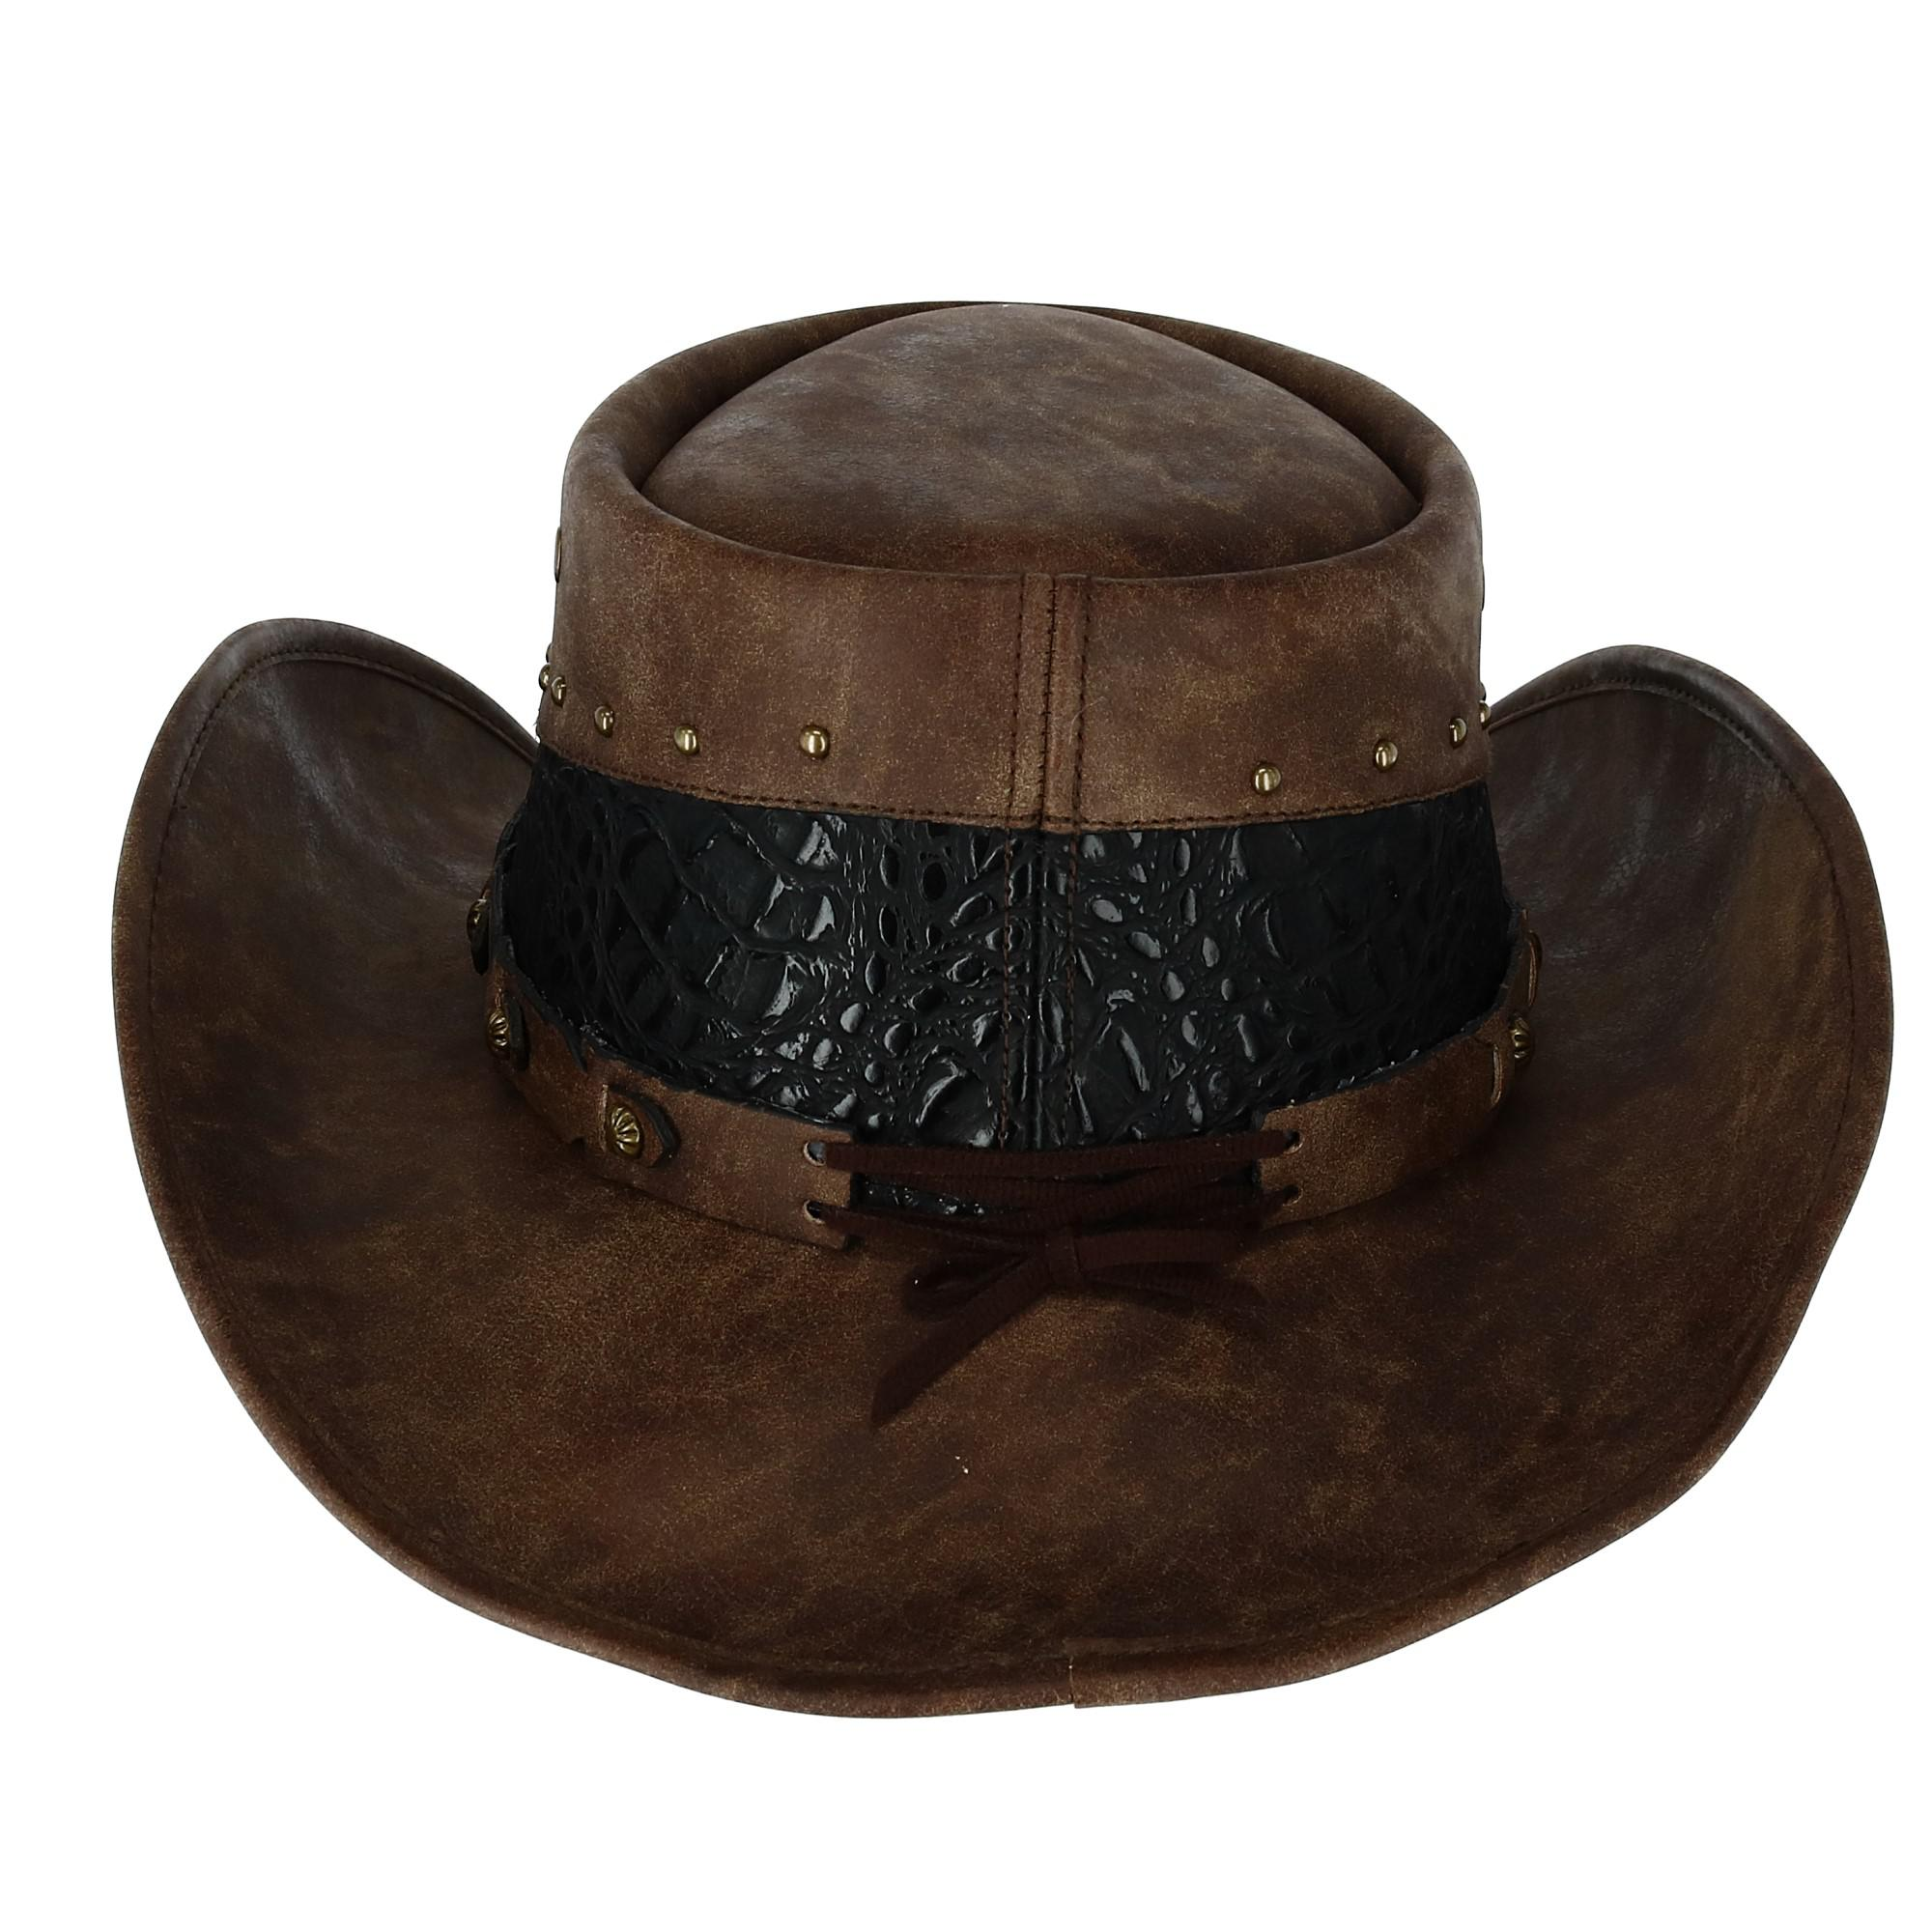 Kenny K Men's Faux Leather Western Hat with Medallion Detailed Crown - image 1 de 5